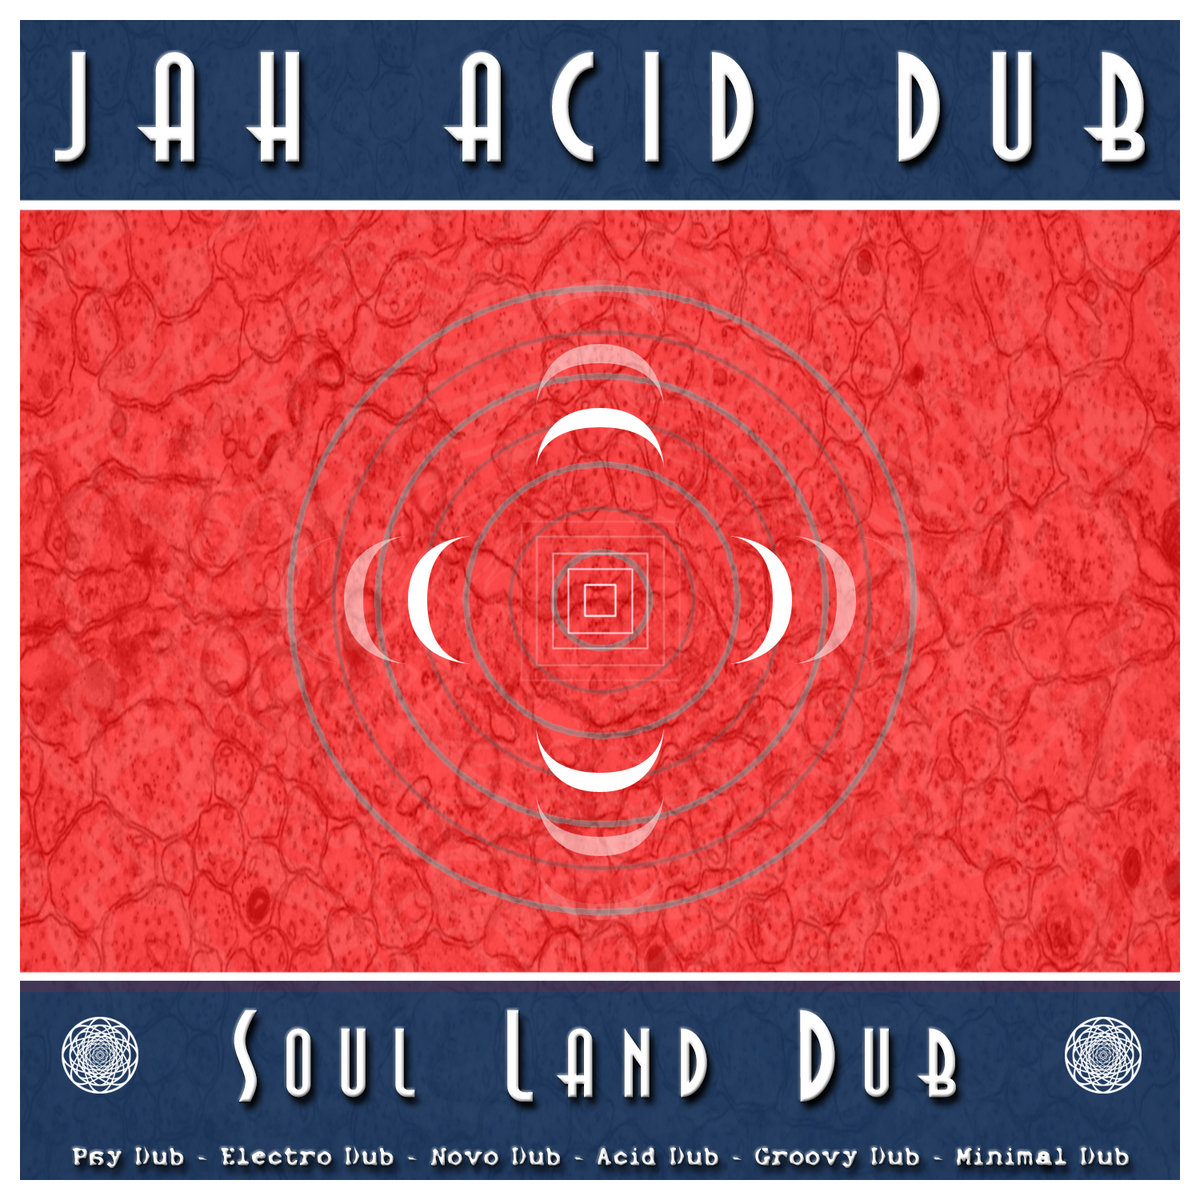 Soul Land Dub | Jah Acid Dub